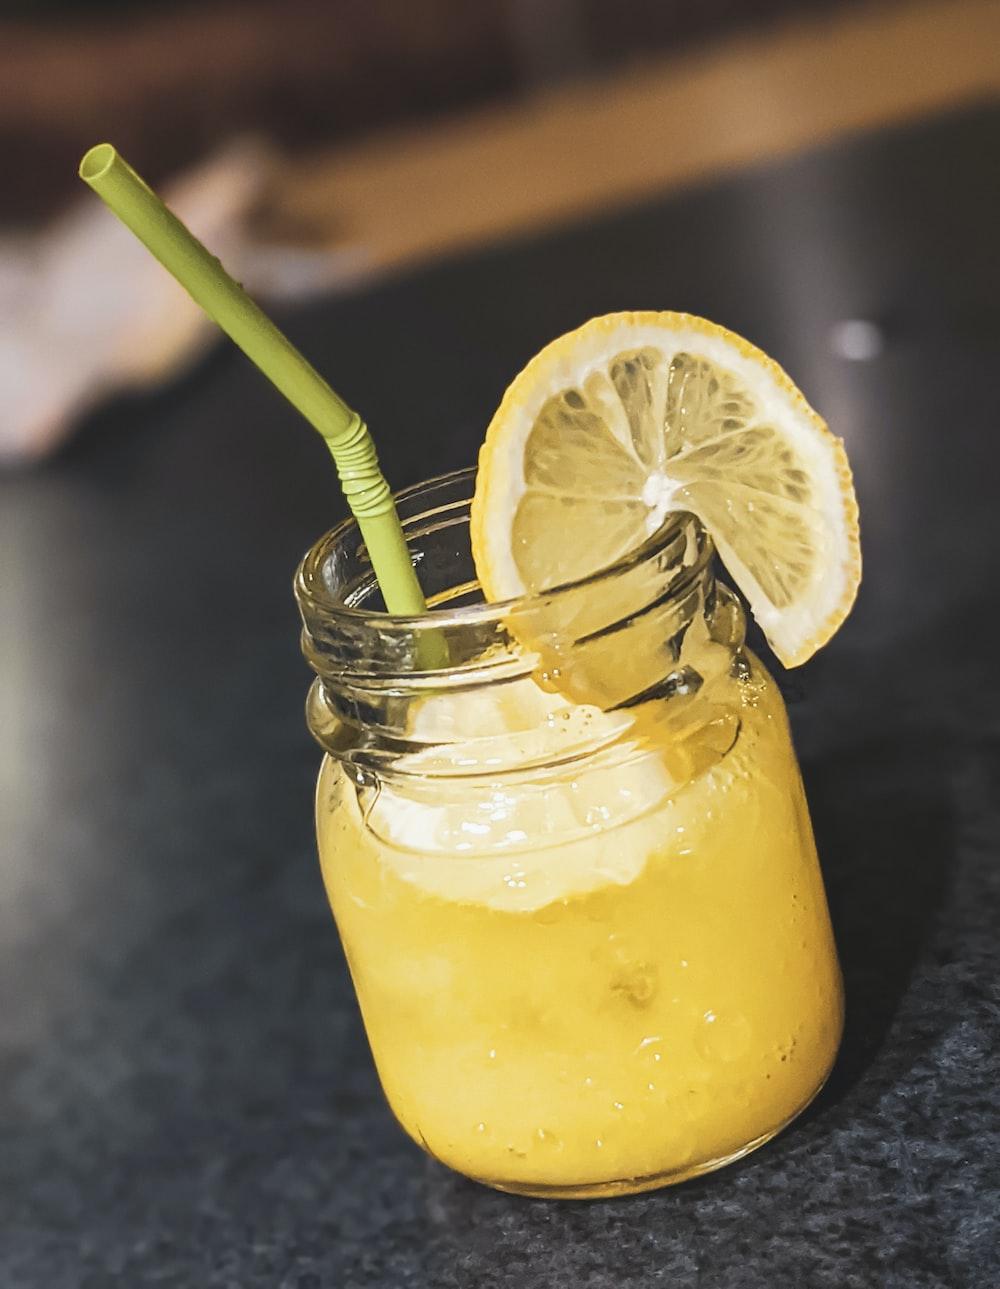 yellow juice in clear glass jar